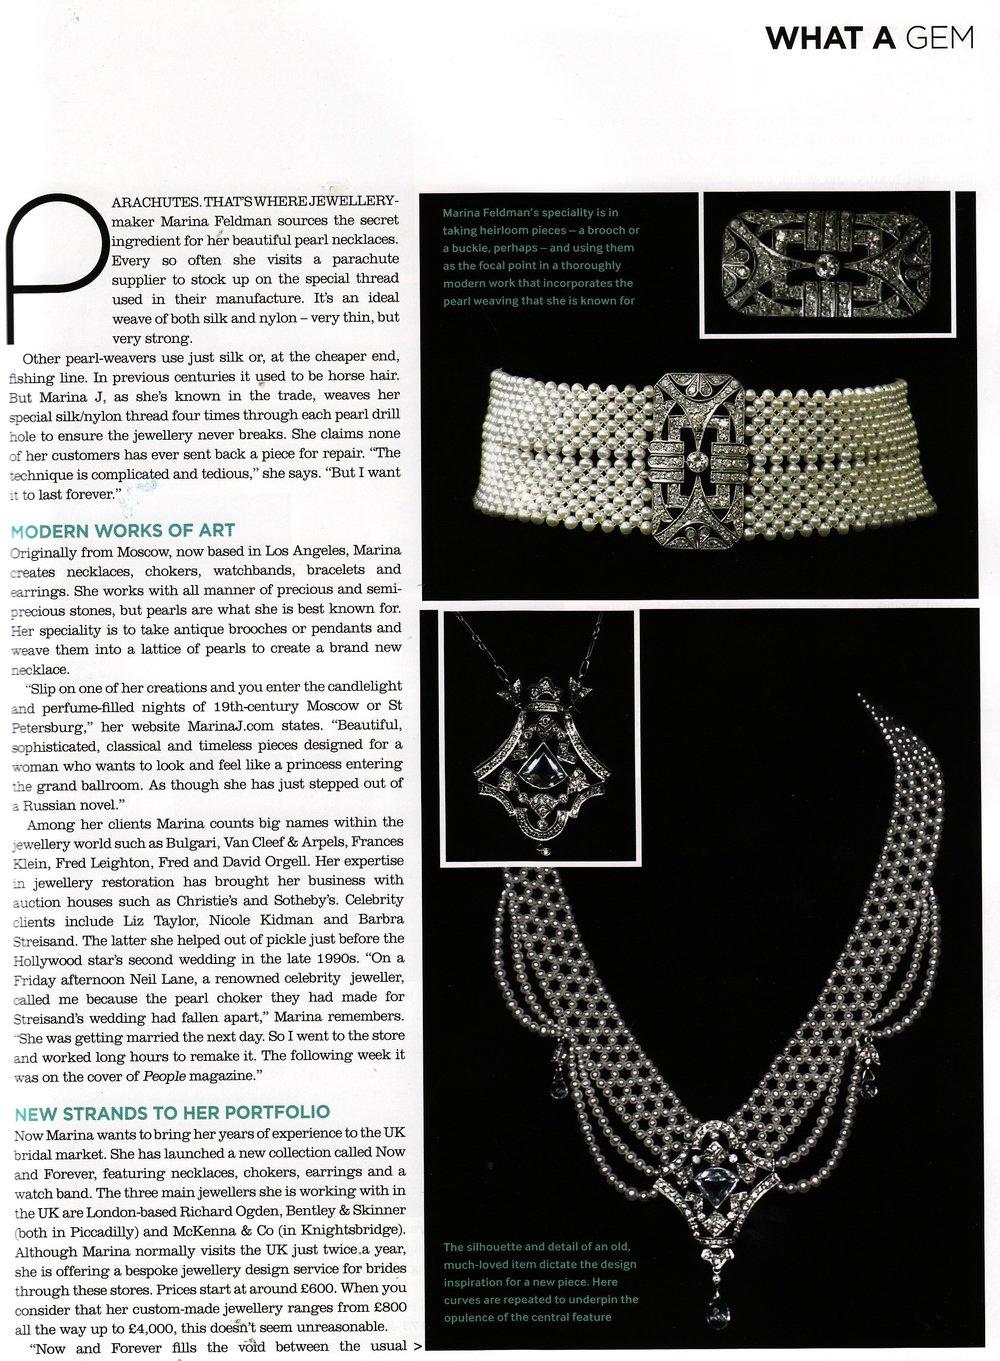 bridal buyer page2 may 2010.jpg